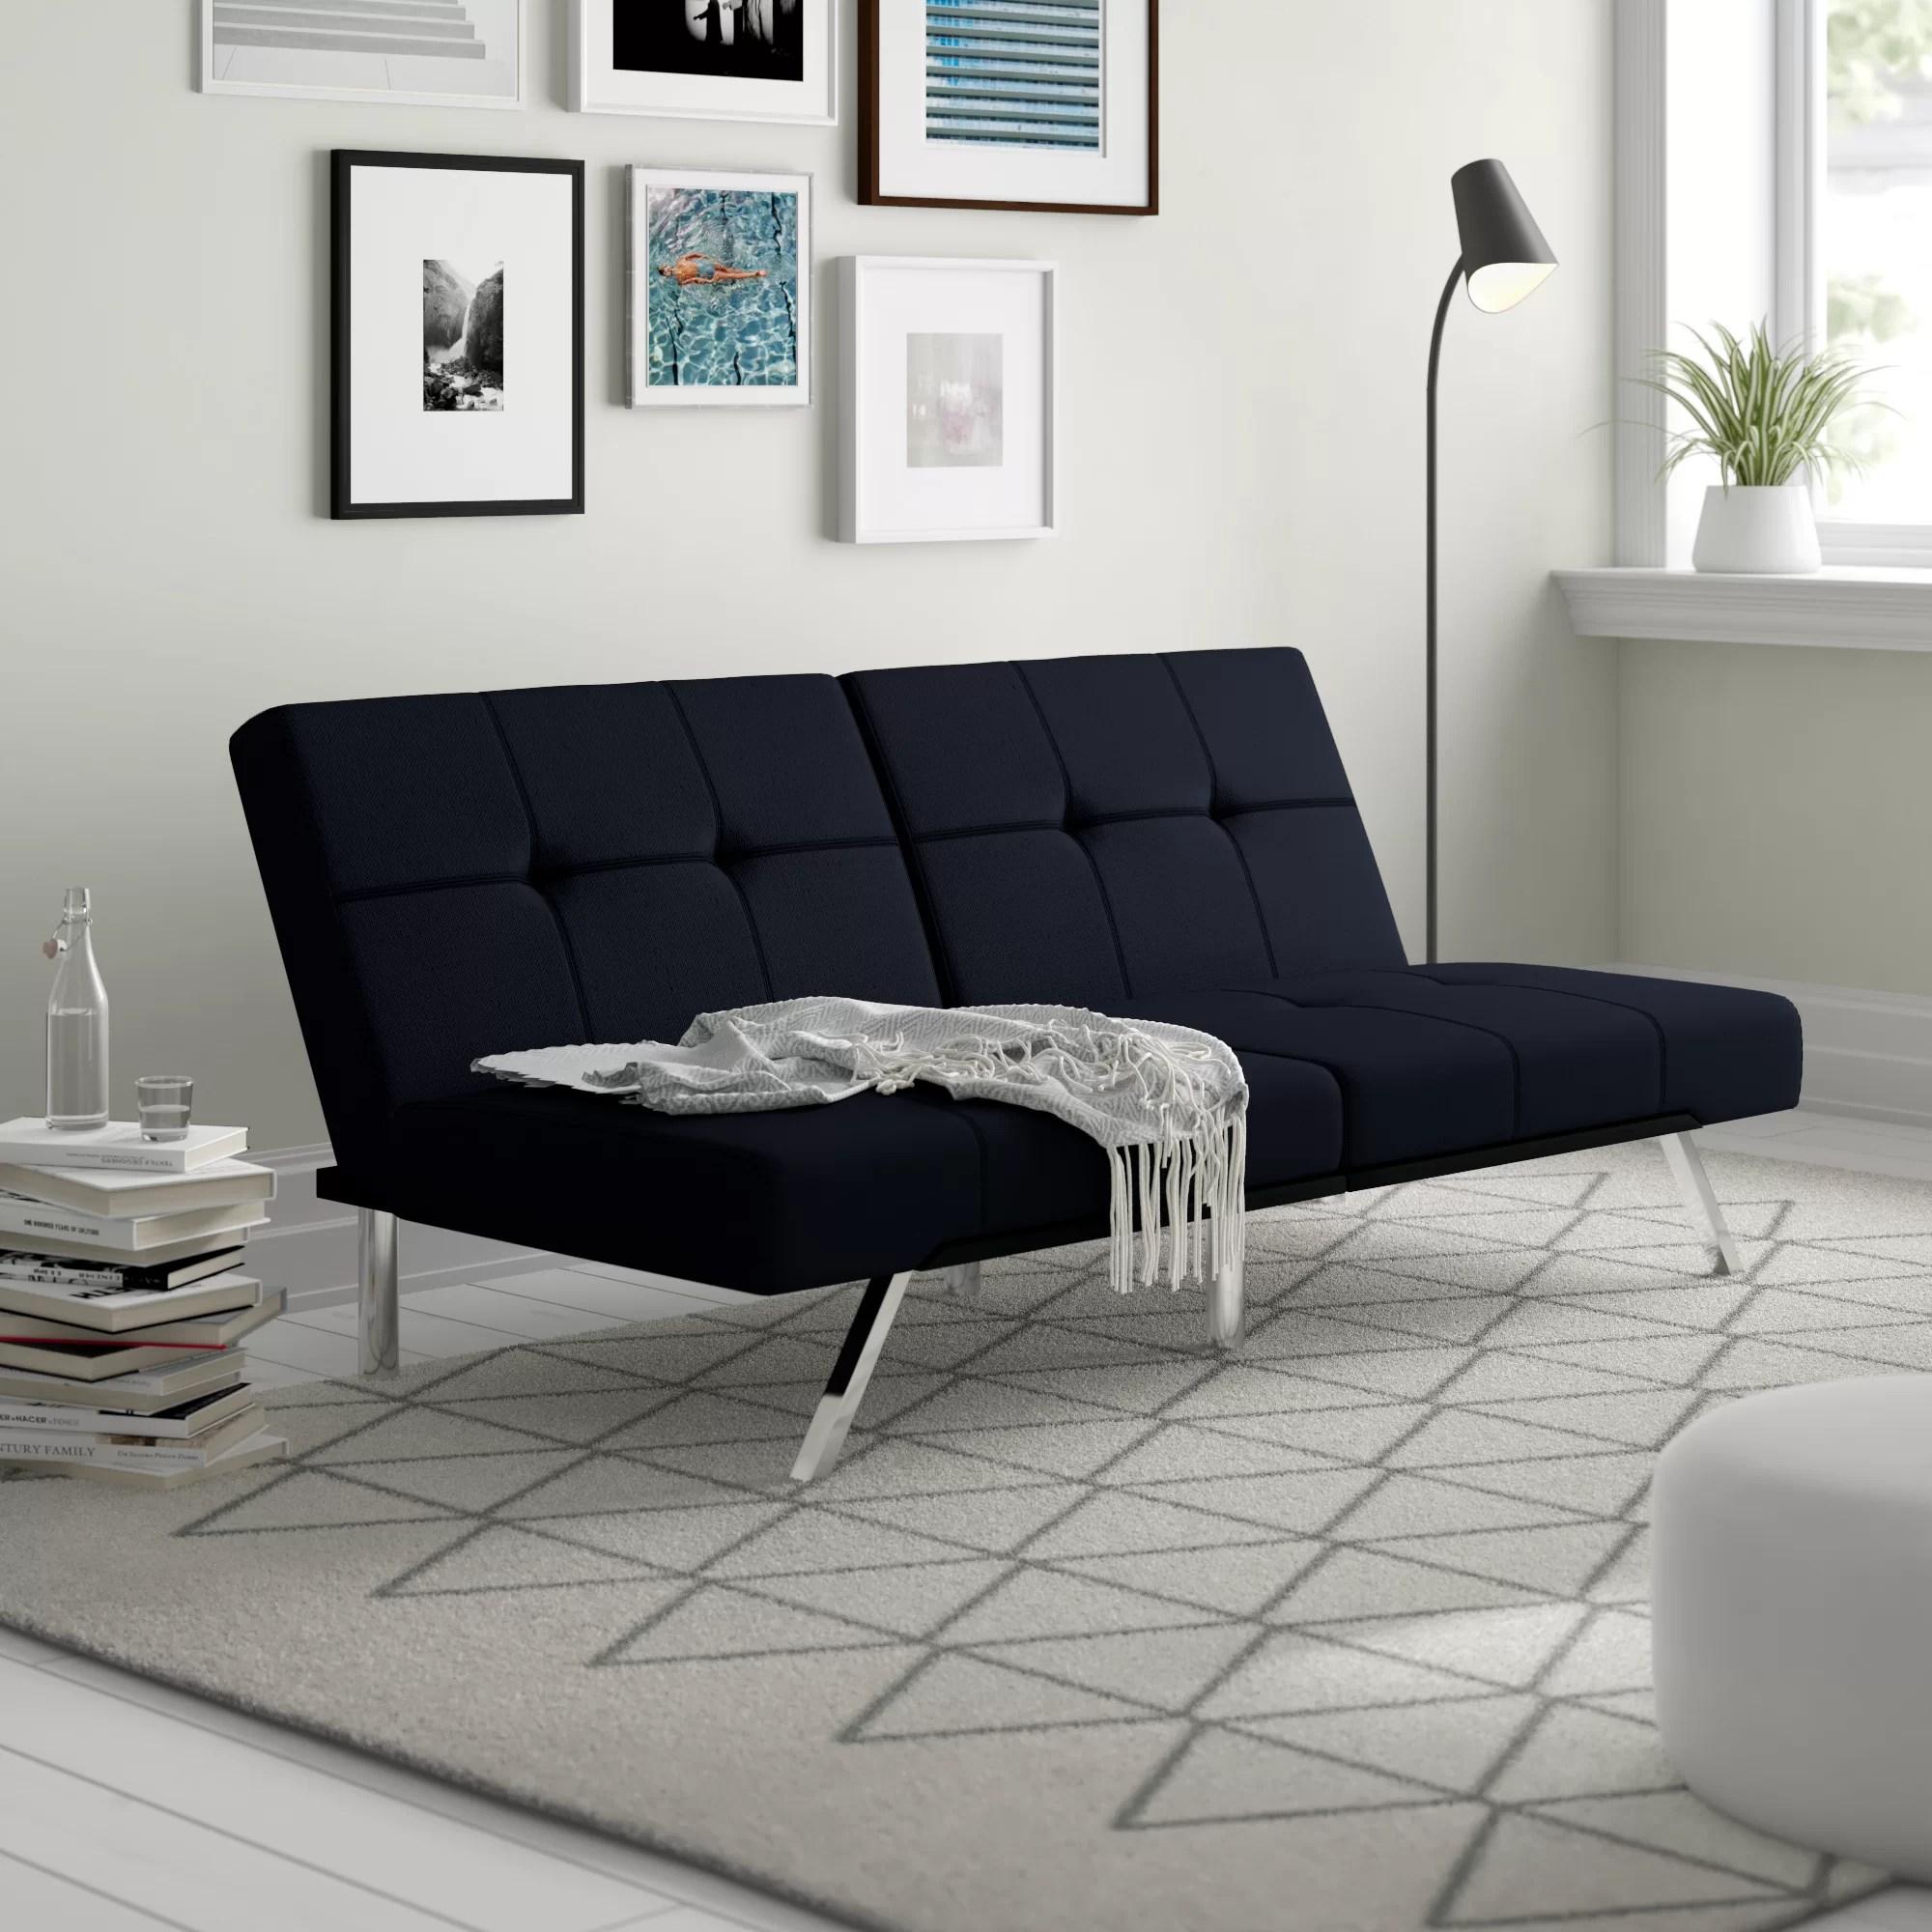 Sleeper Sofa Sale New Orleans | Furniture Cool Room ...